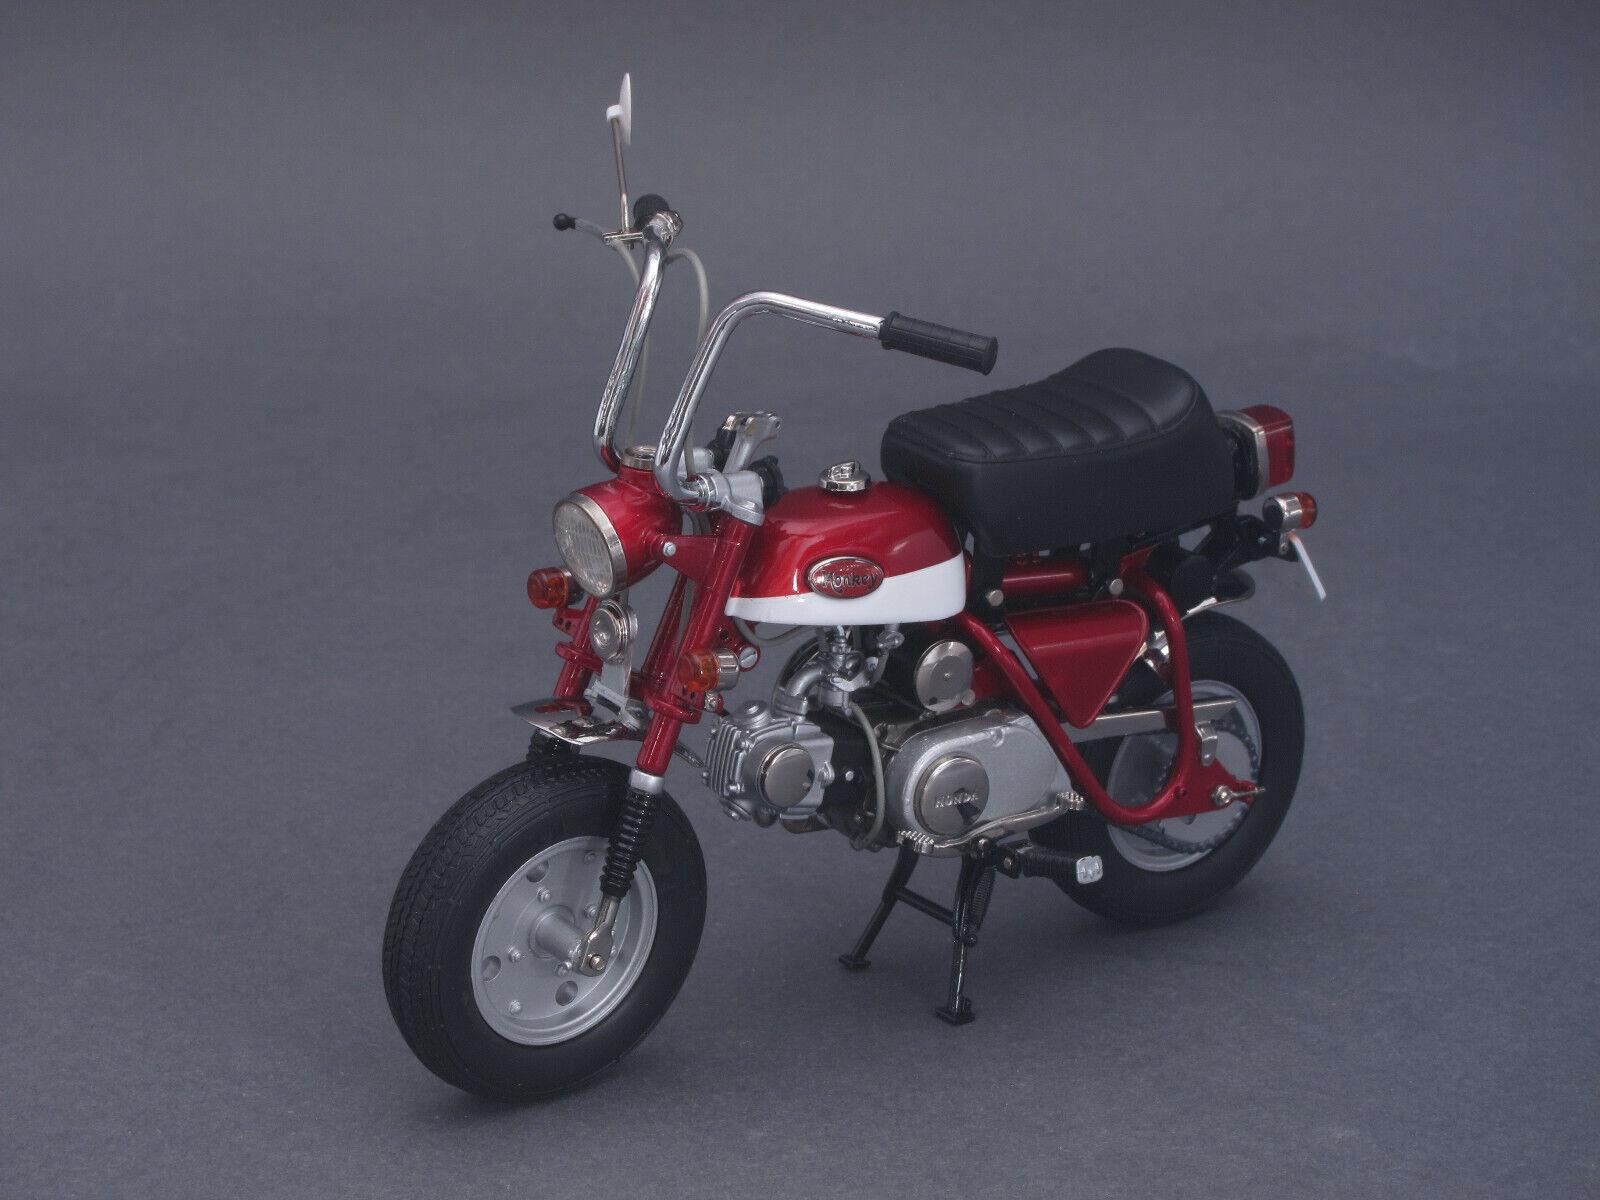 1/10 Ebbro HONDA Monkey z50z 1970-ROSSO - 1/12 - 10020 - 142041